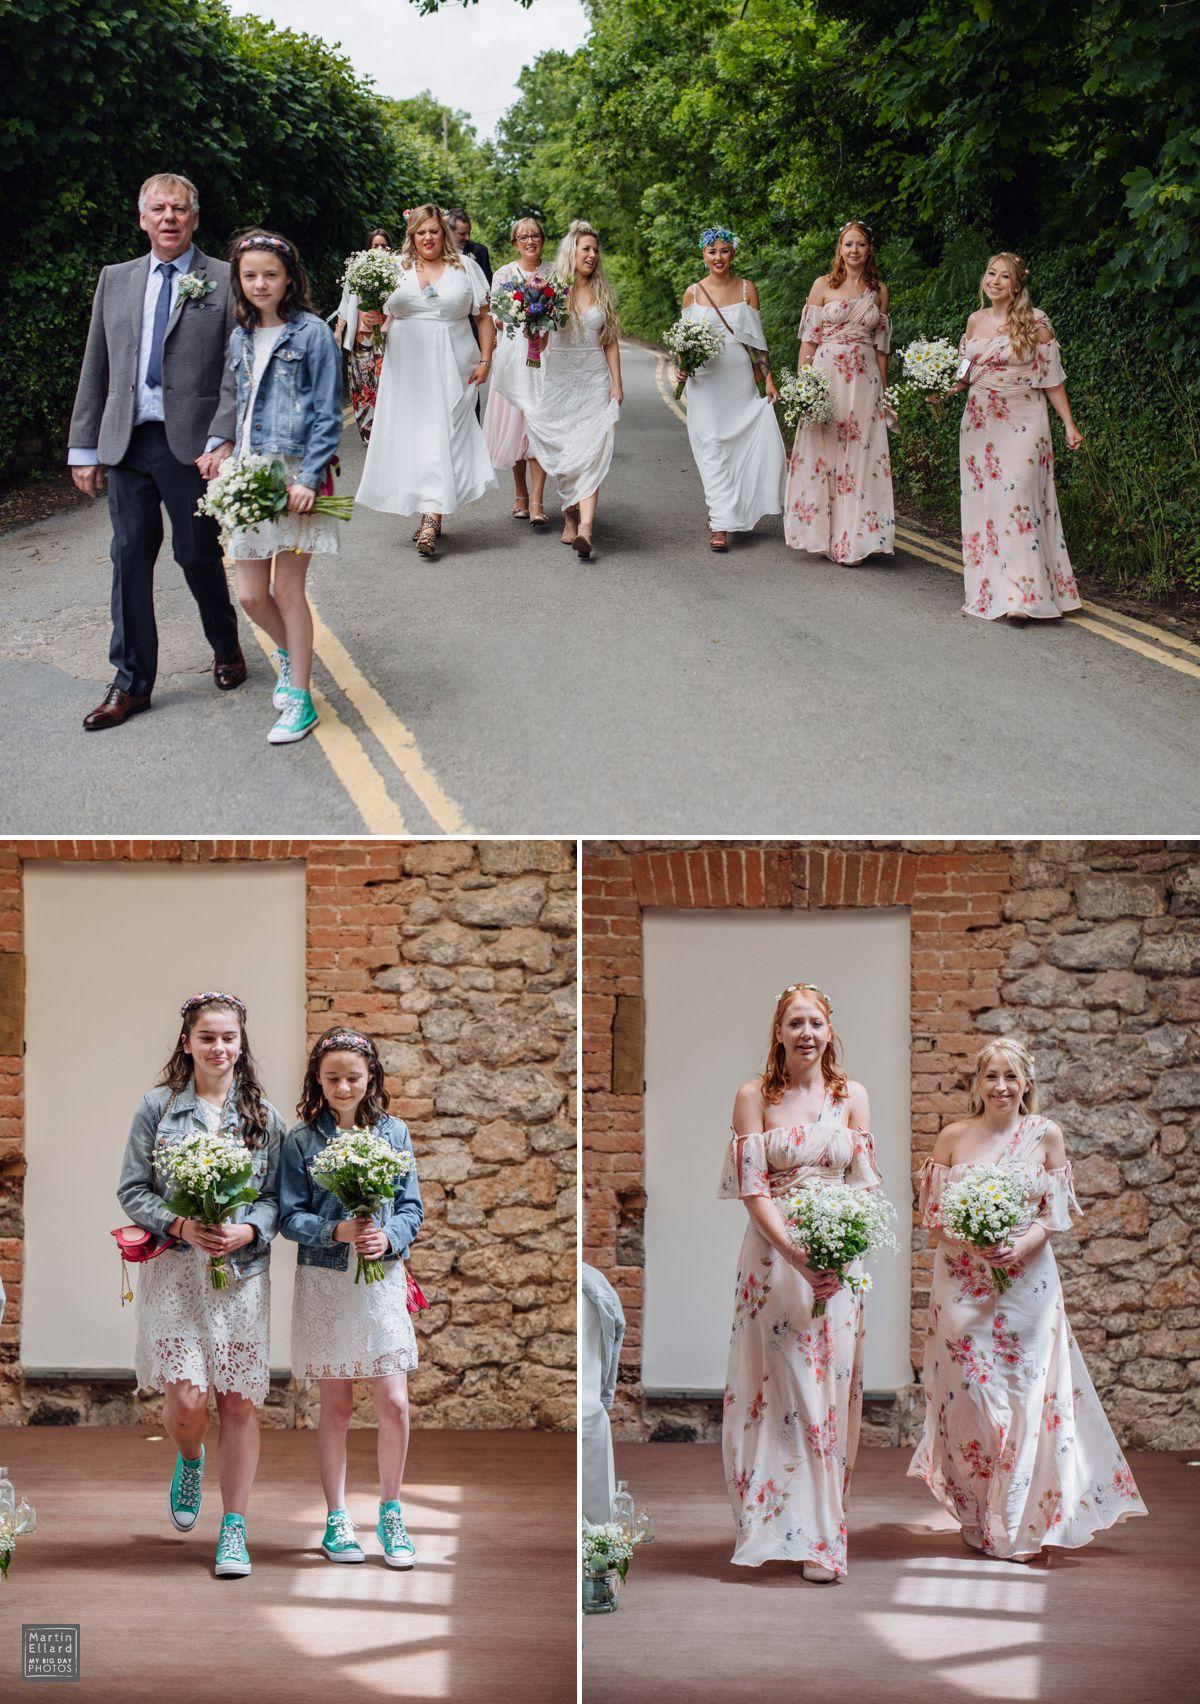 rocka and roll wedding